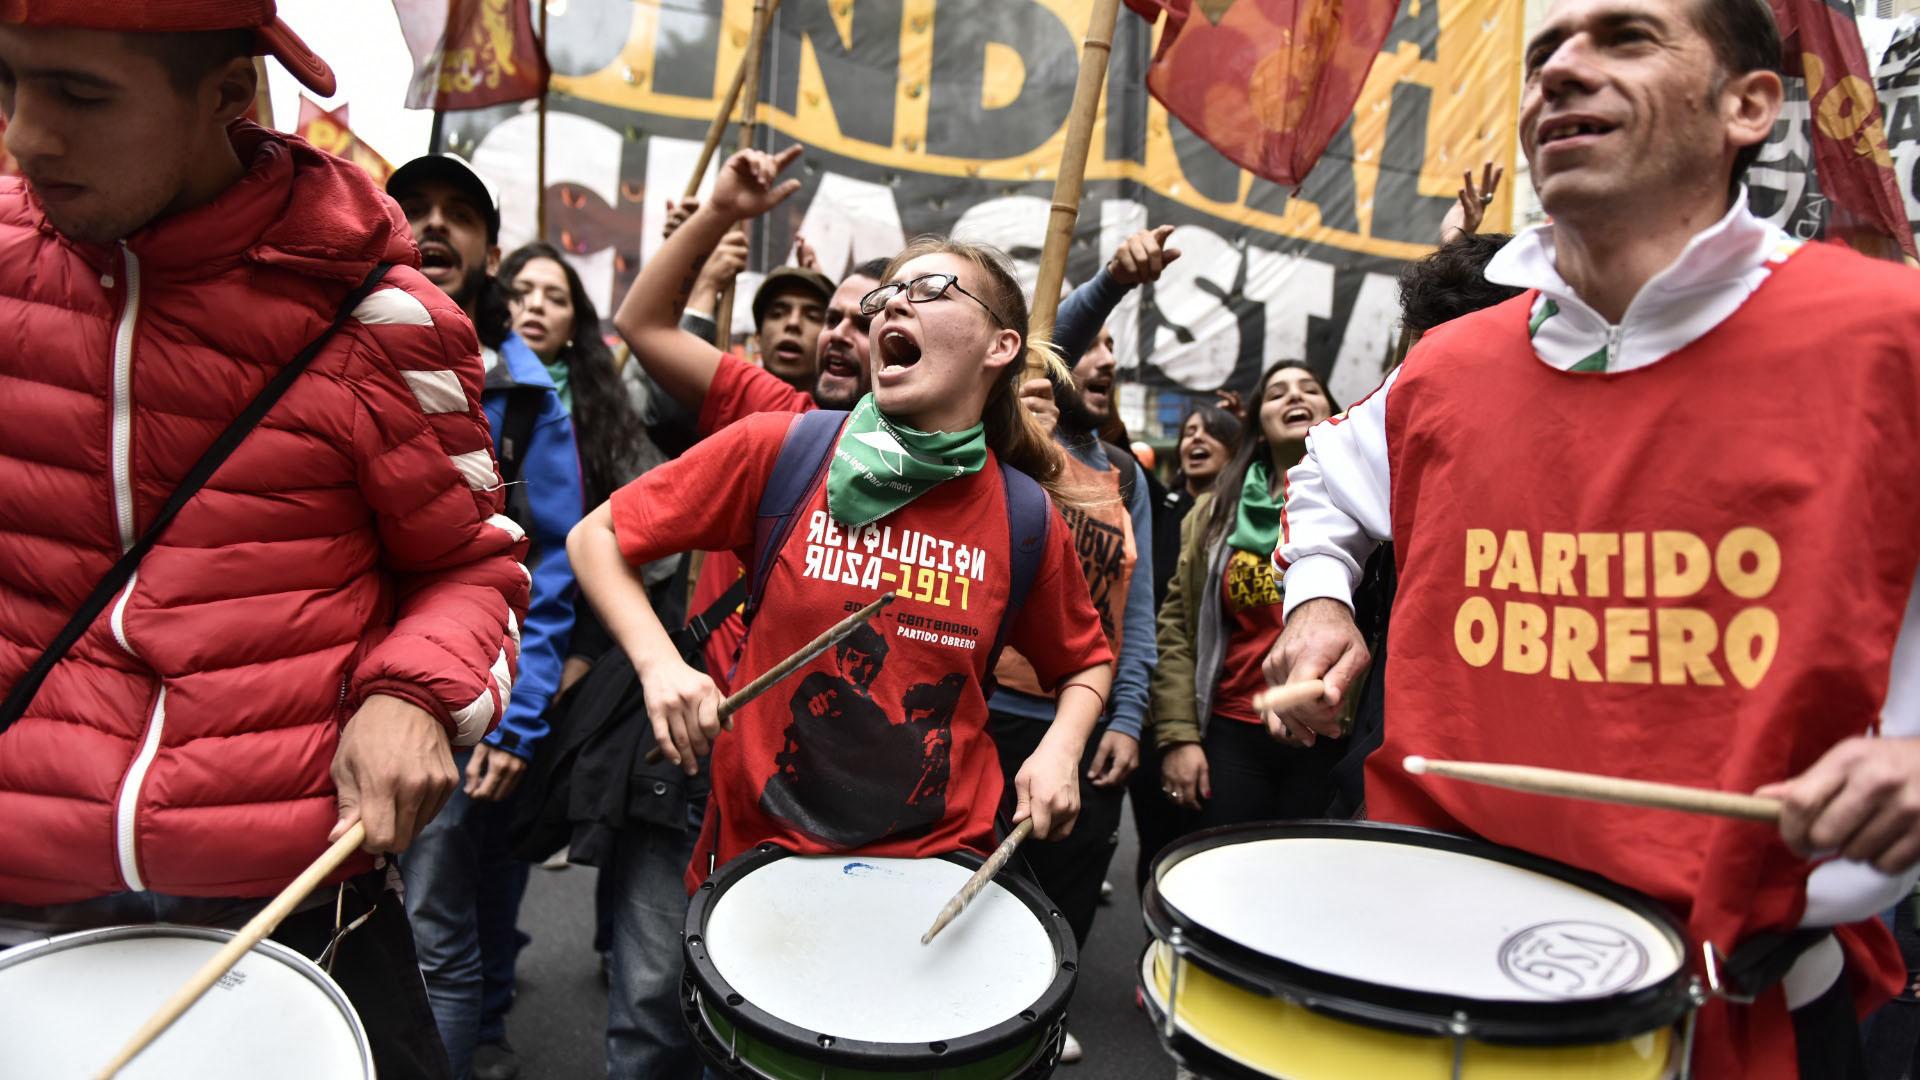 Manifestantes del Partido Obrero